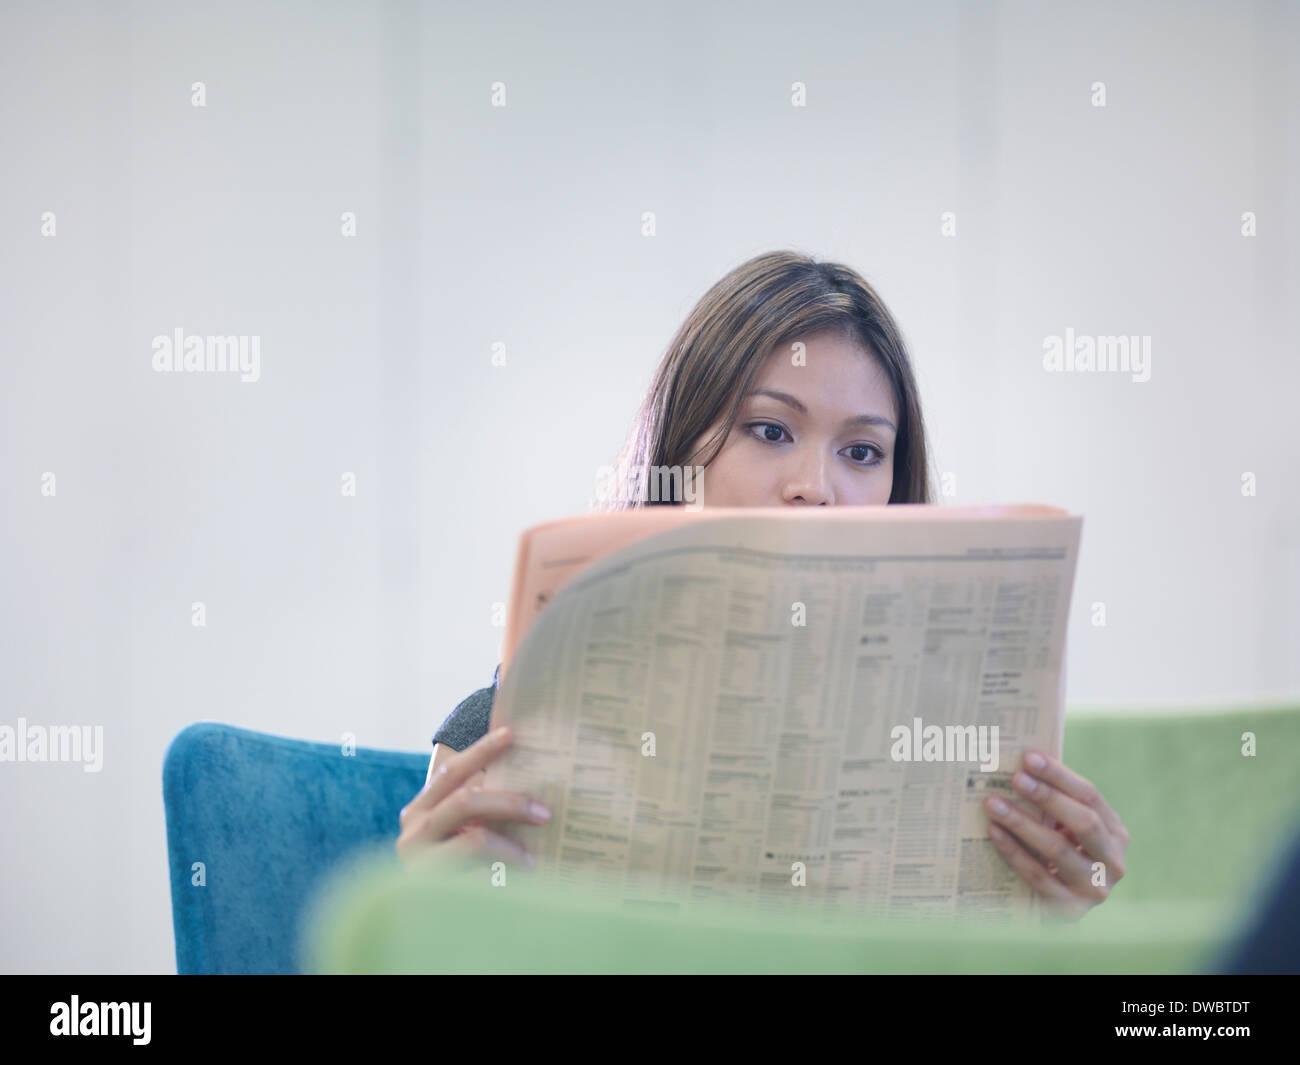 Businesswoman reading British newspaper - Stock Image